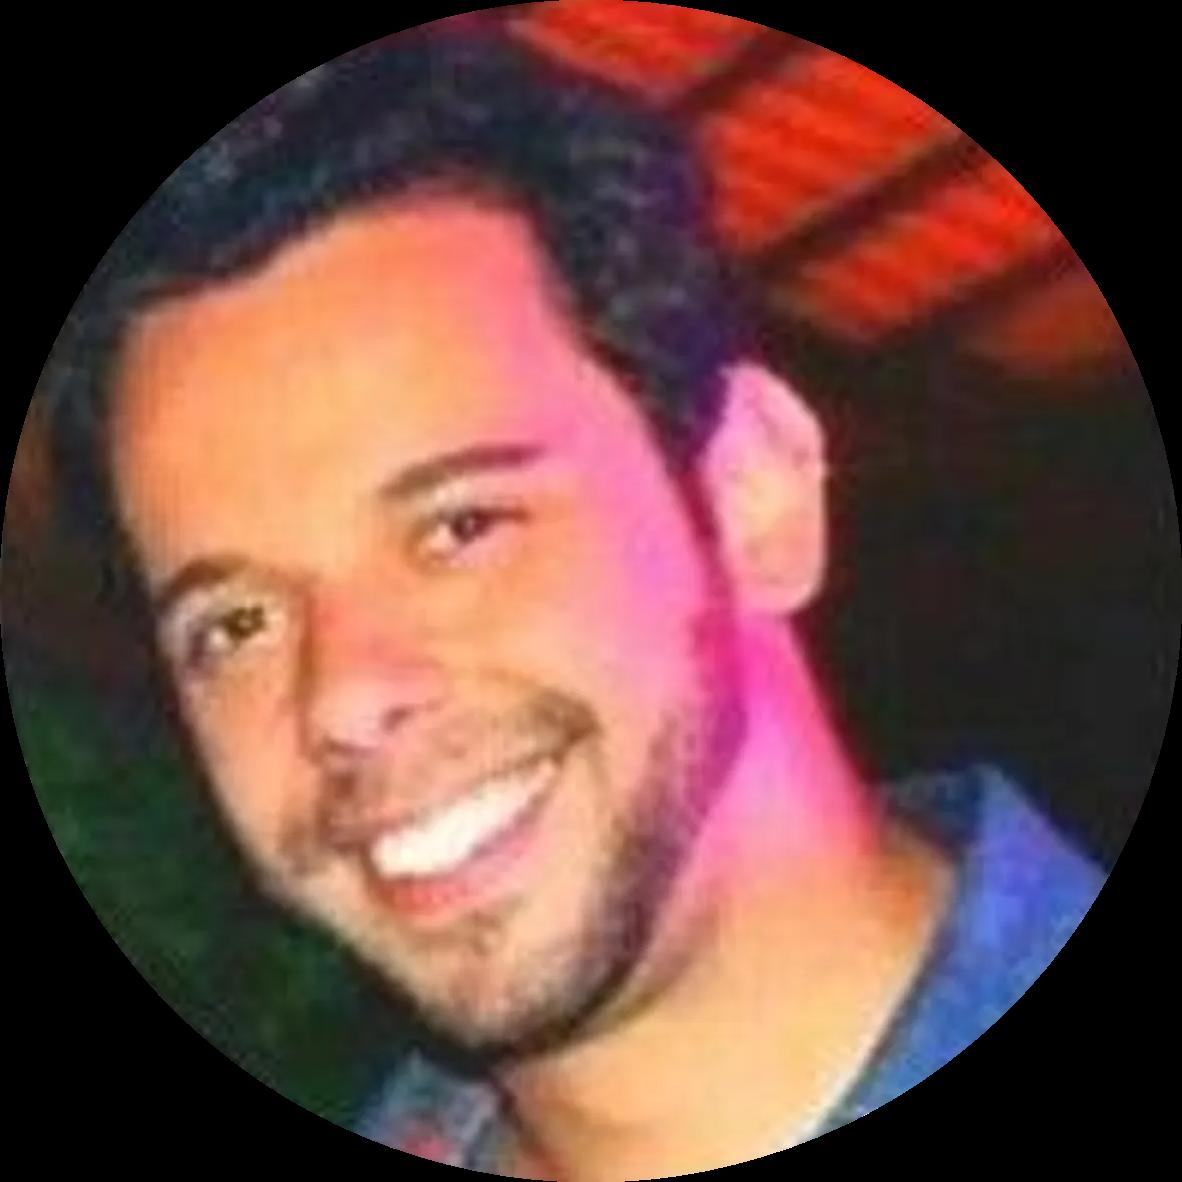 Luiz Chiqueto - Site Manager